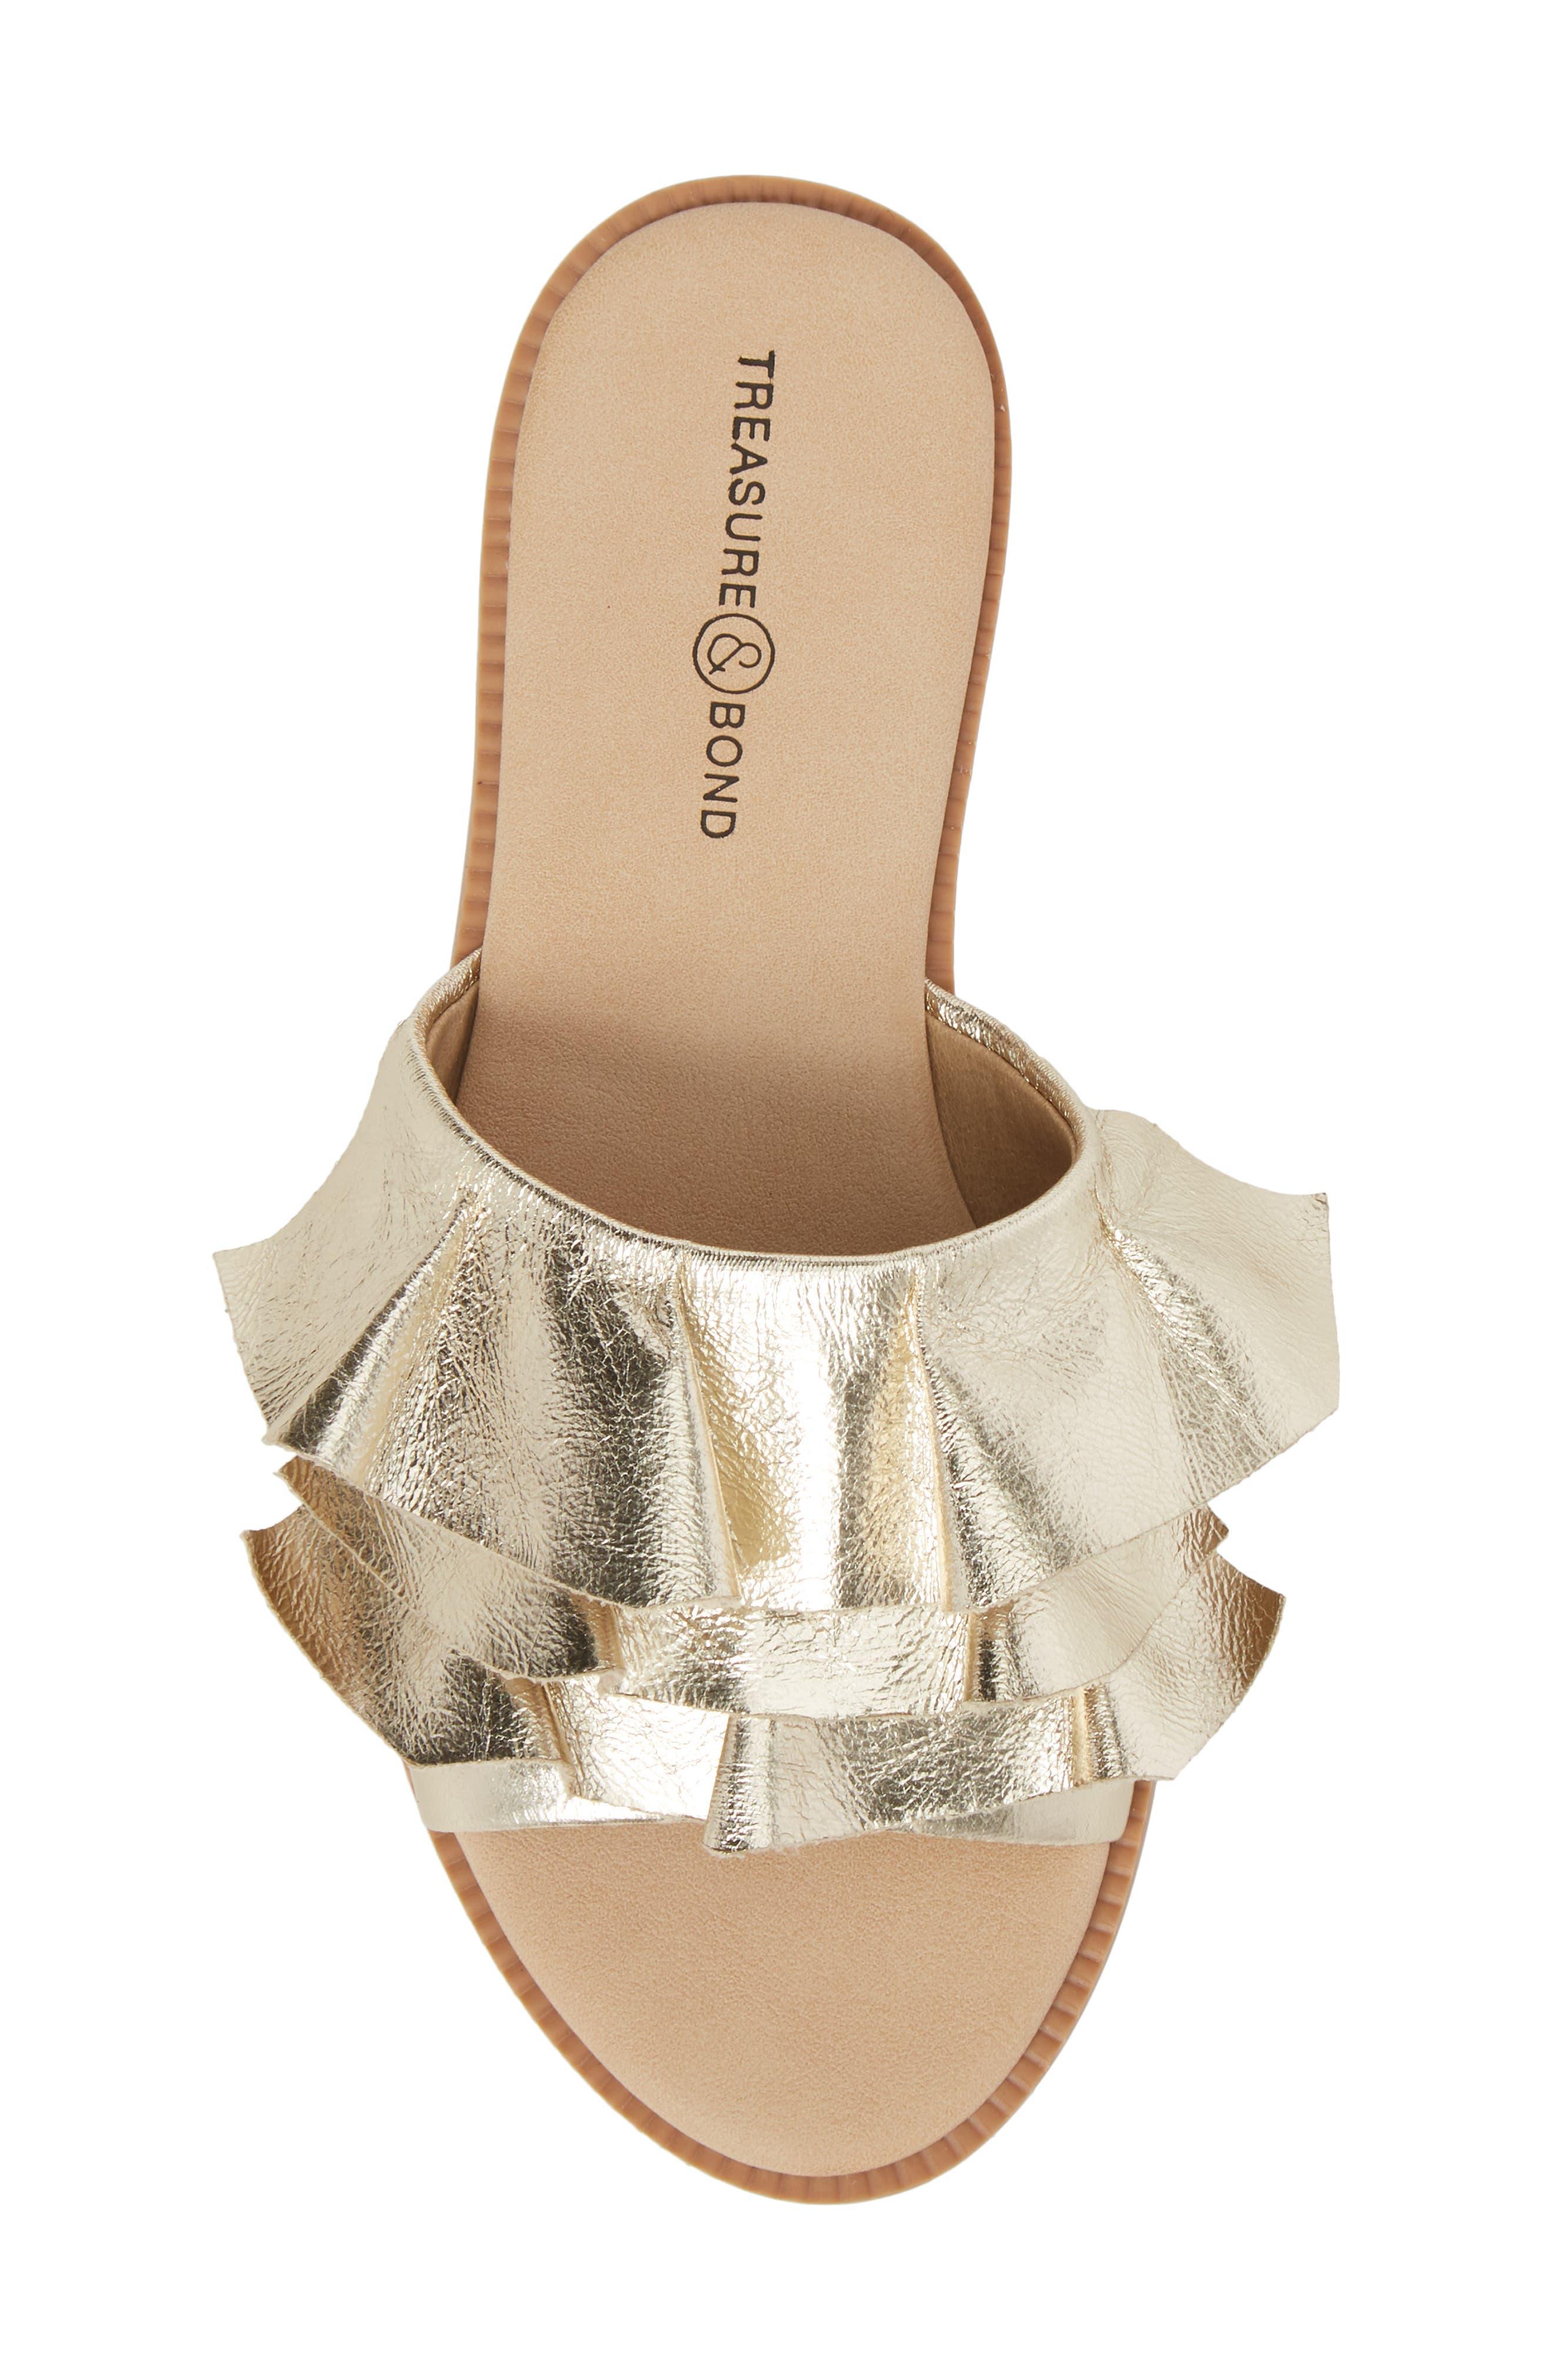 Ruby Ruffled Slide Sandal,                             Alternate thumbnail 5, color,                             Gold Crackle Faux Leather